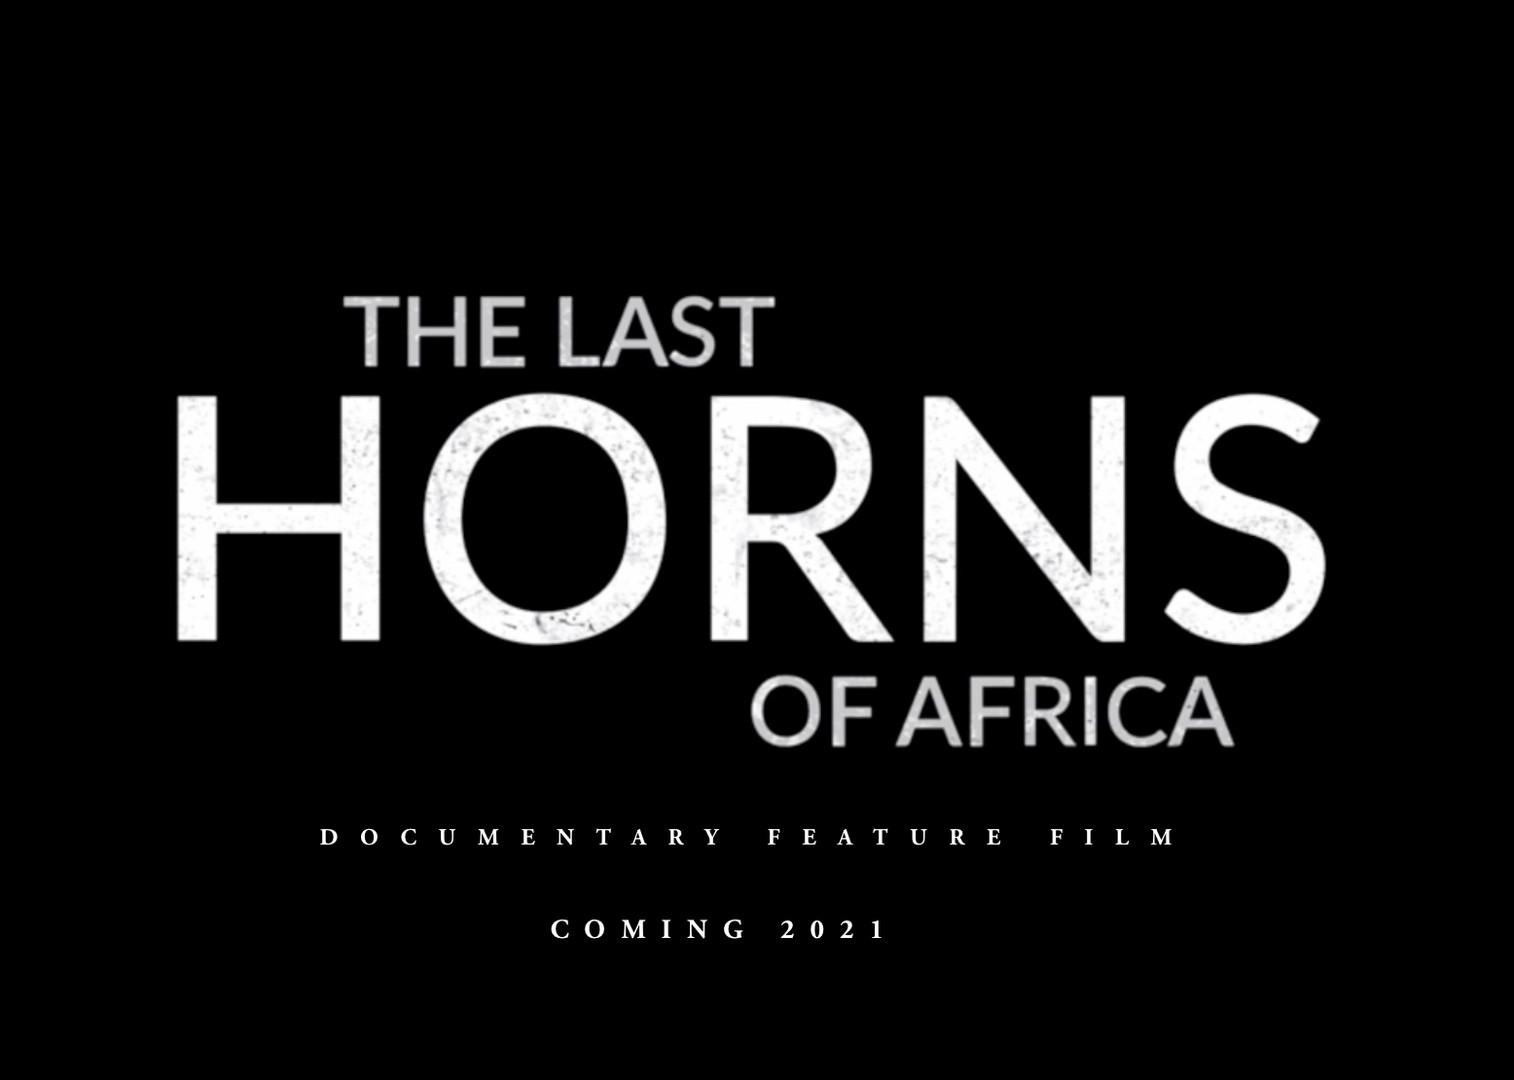 Horns of Africa_Coming 2021.jpg